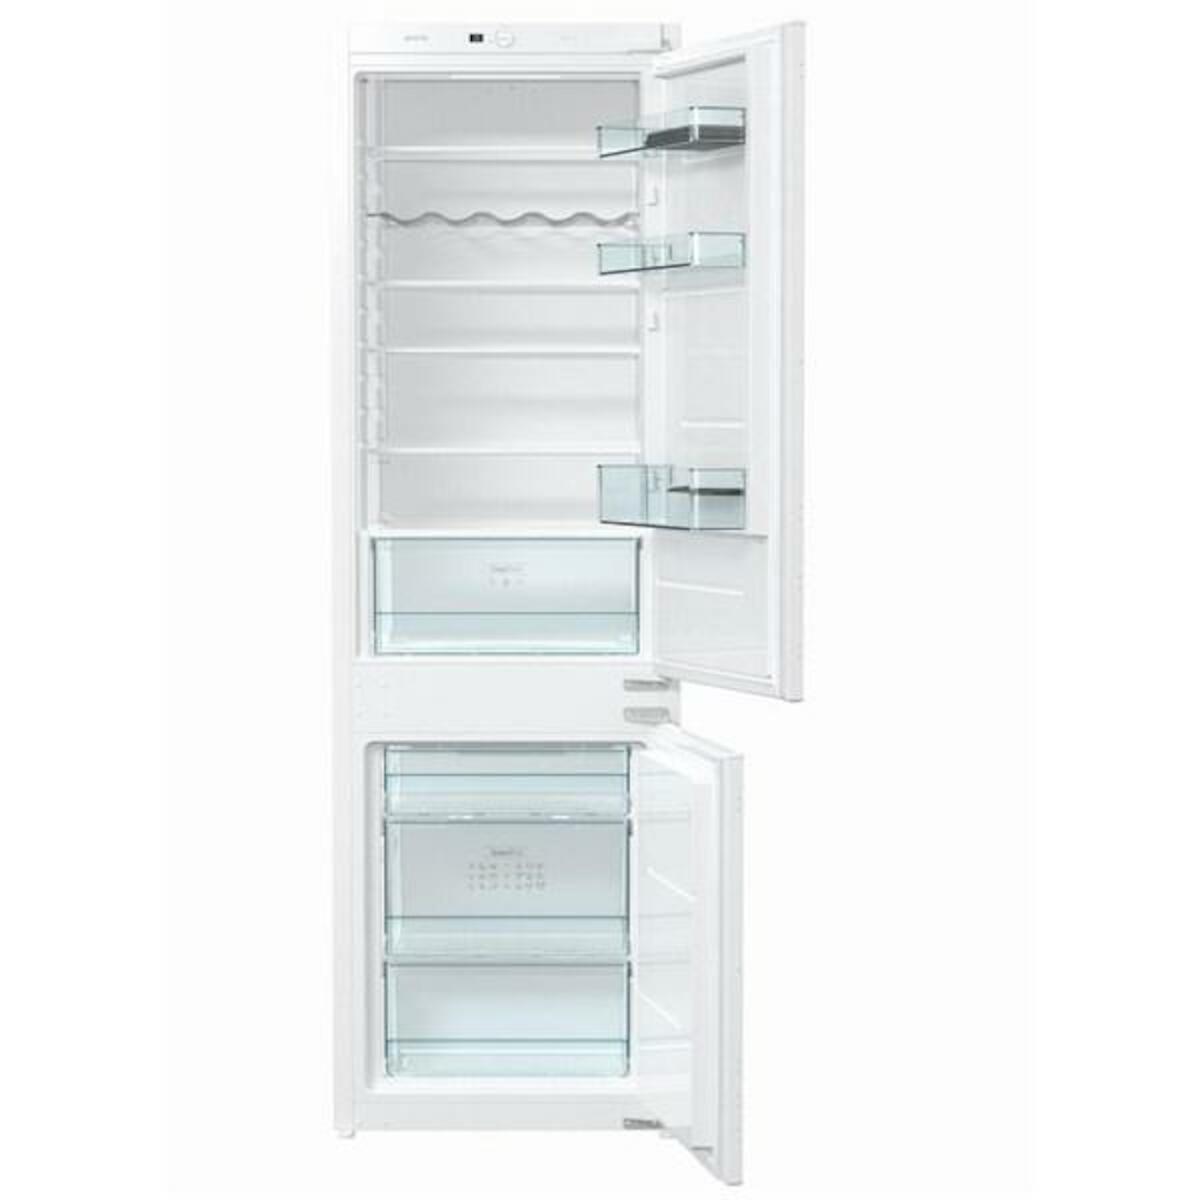 Vstavaná chladnička Gorenje NRKI4182E1